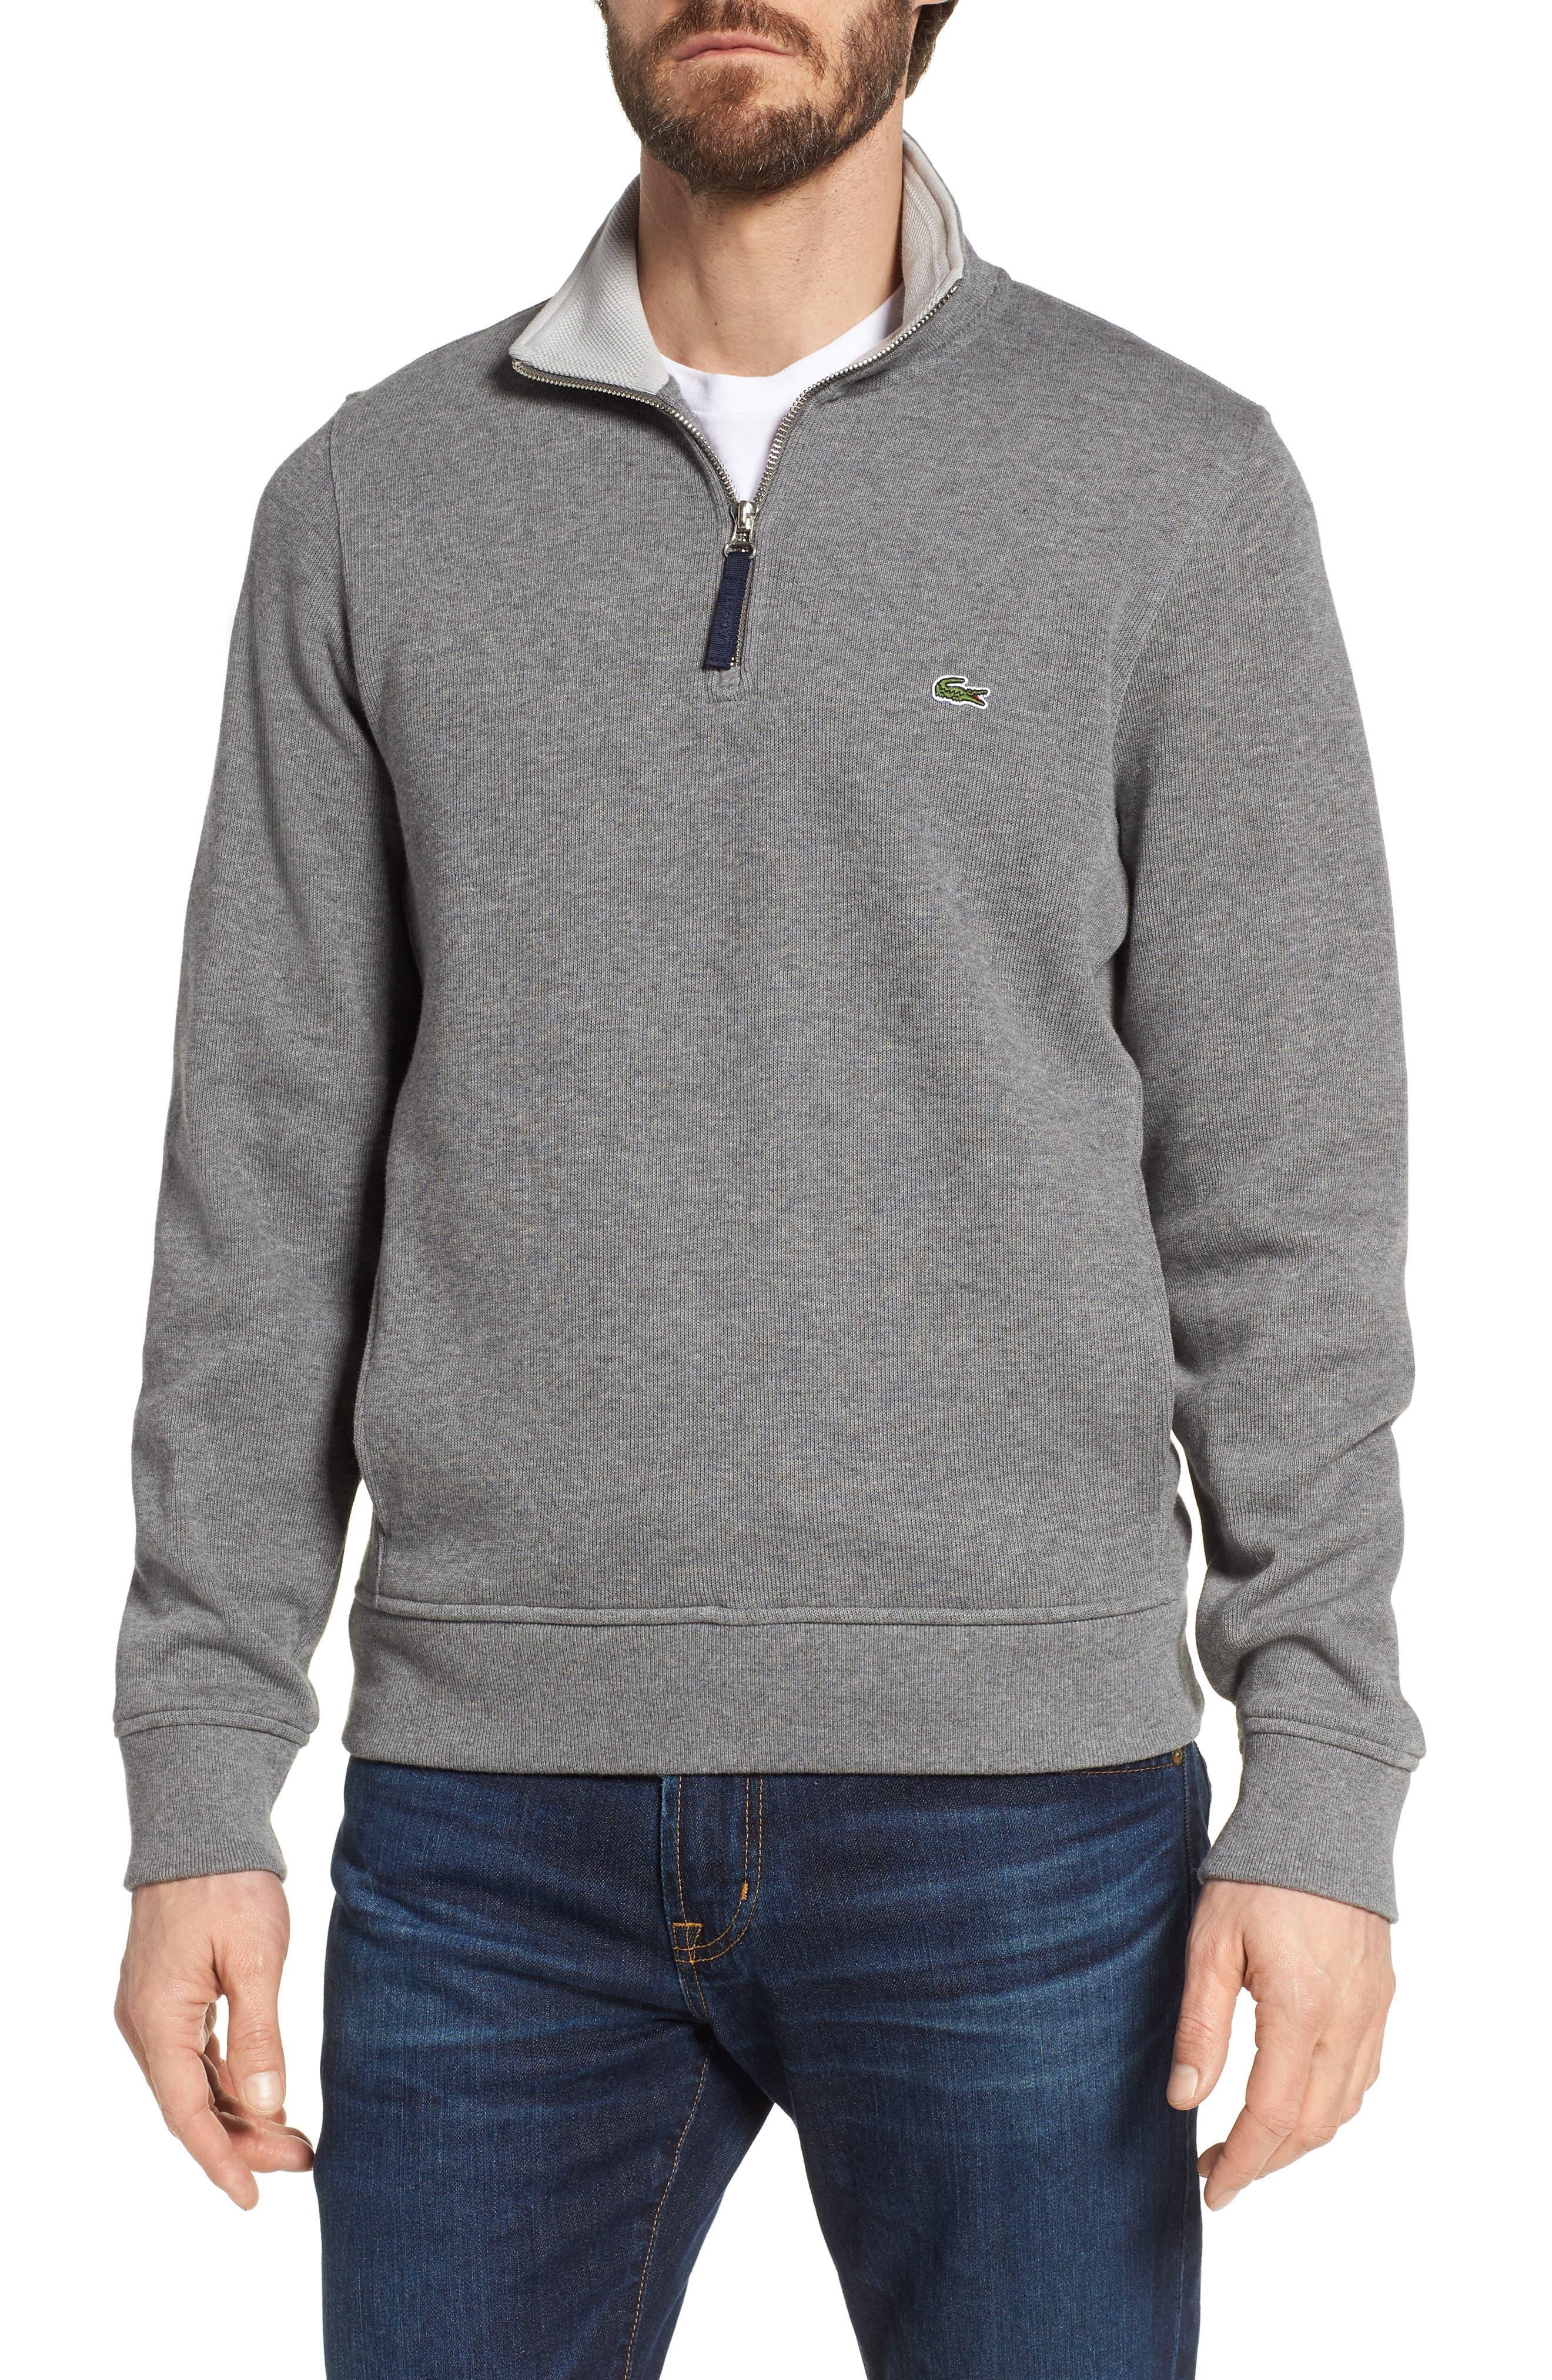 Quarter Zip Cotton Interlock Sweatshirt,                         Main,                         color, GALAXITE CHINE/ NIMBUS